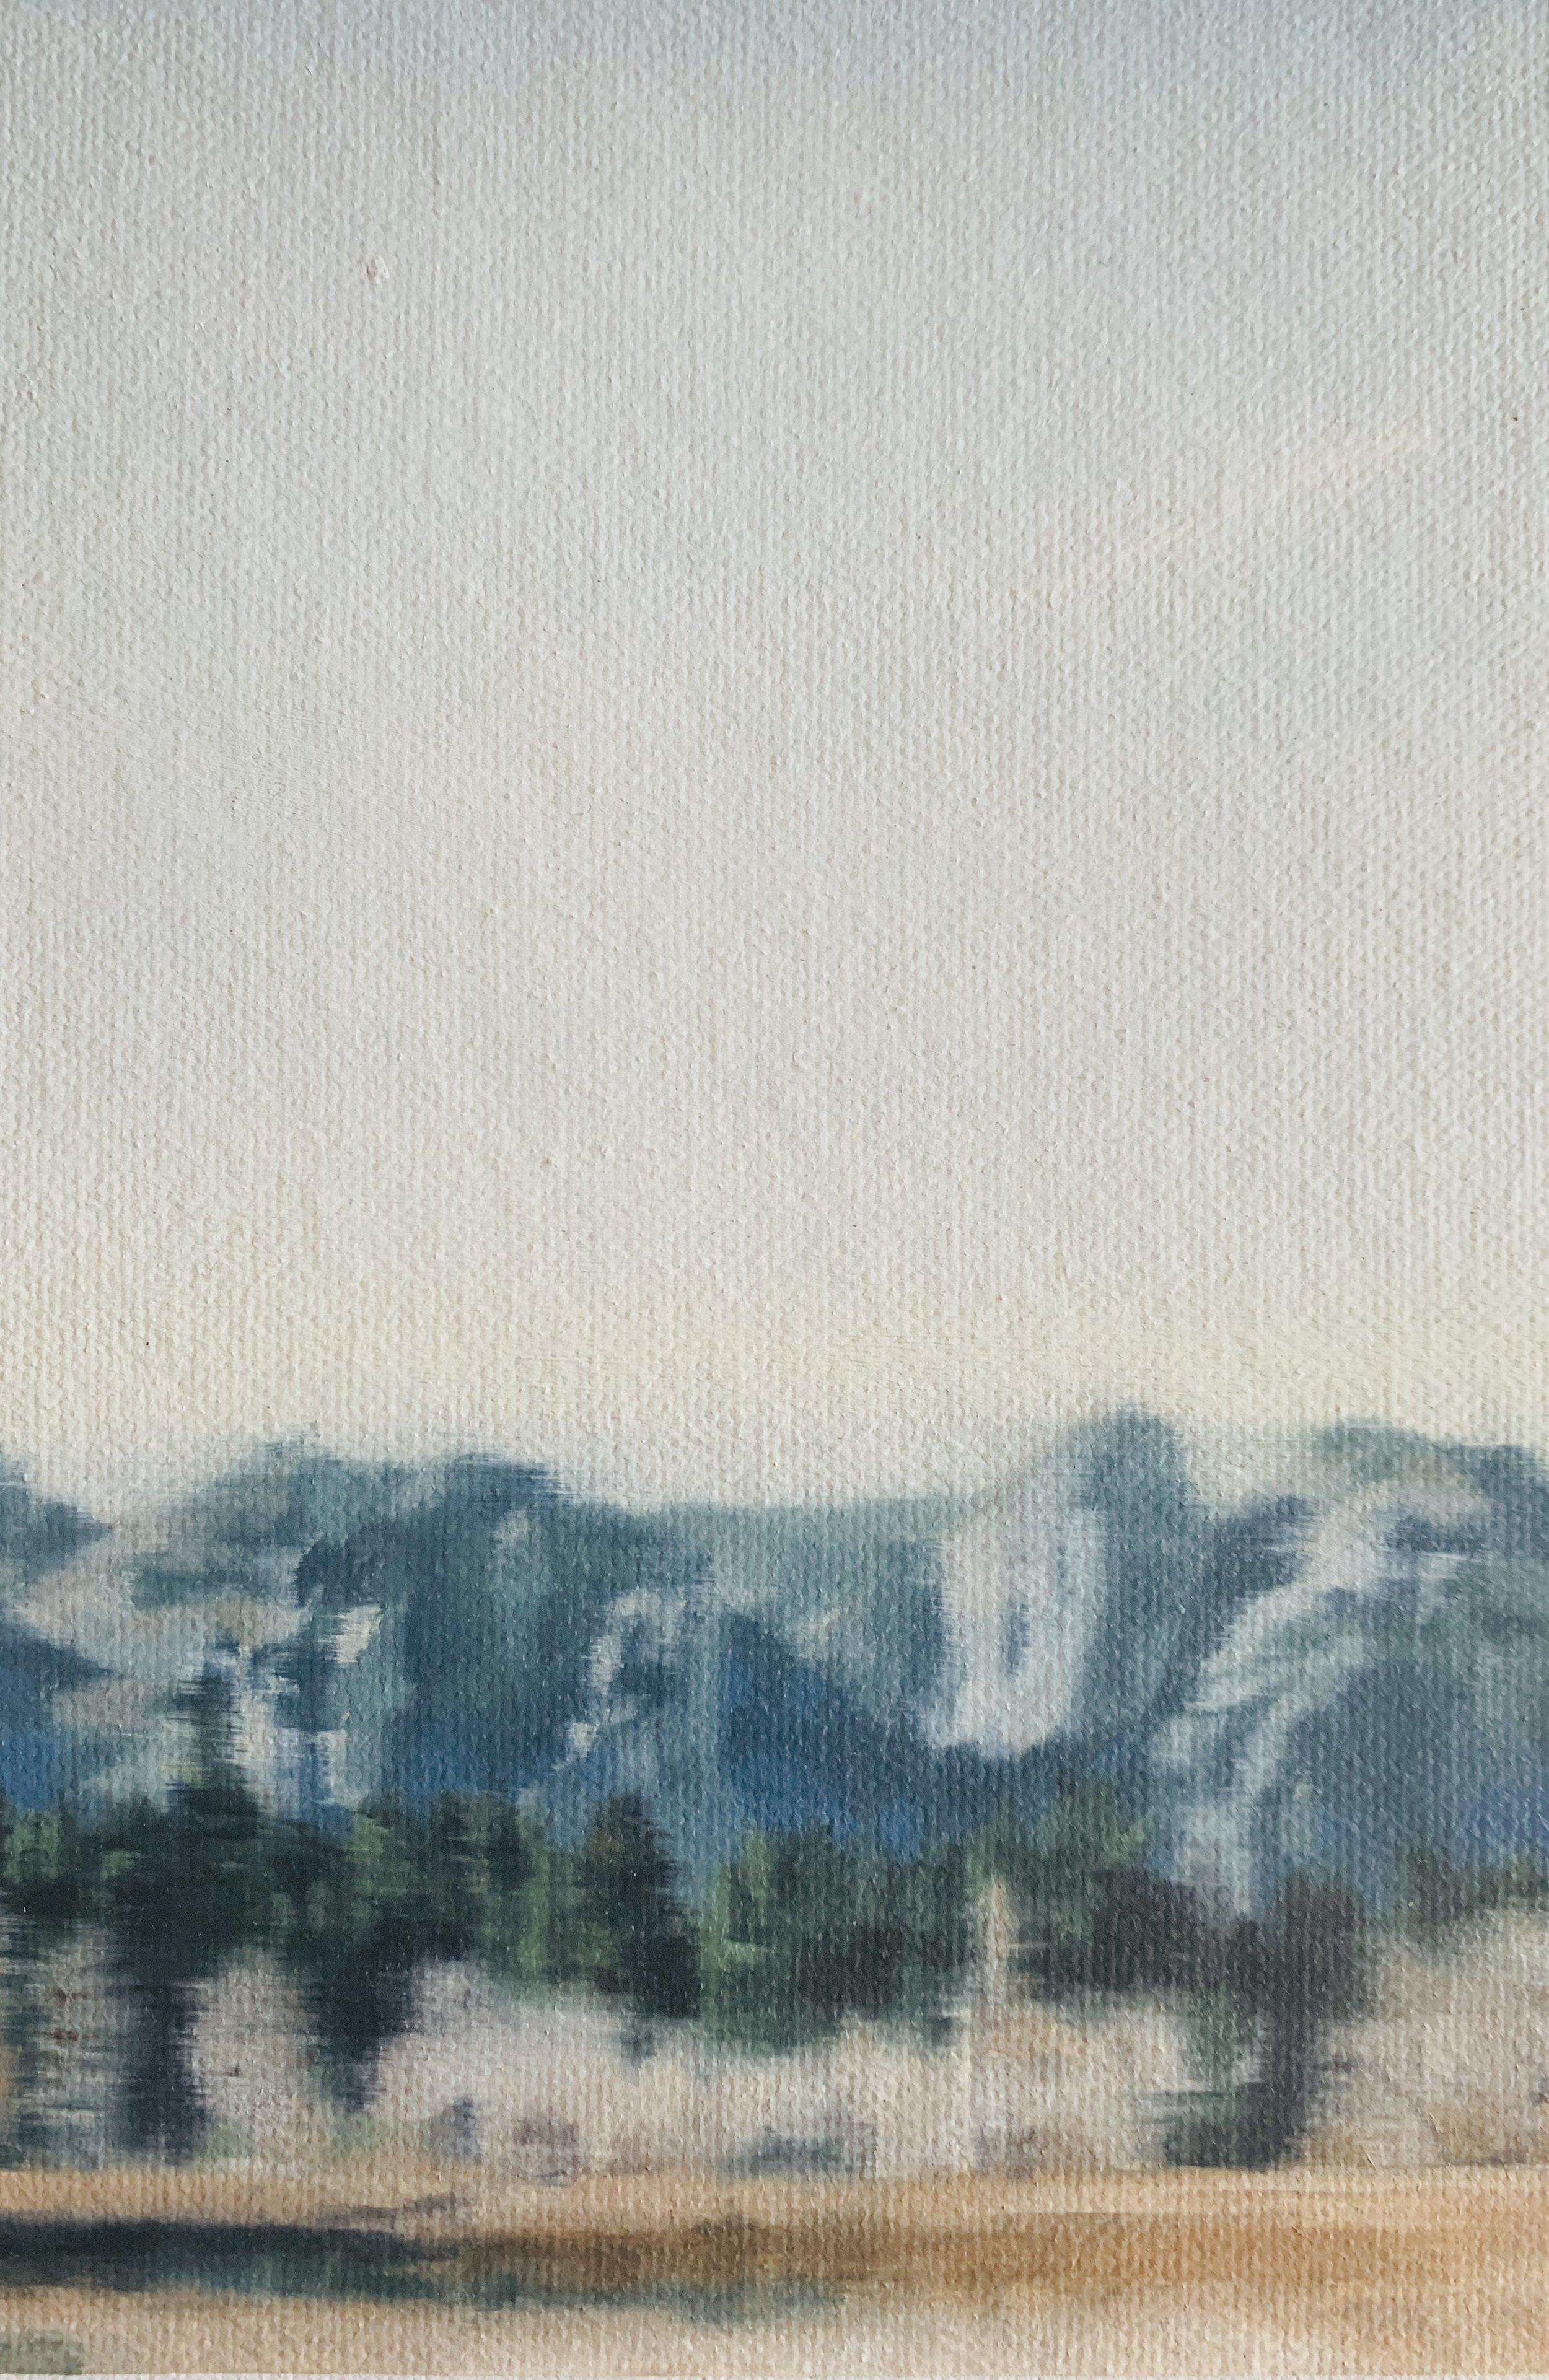 AMELIA CARROLL  image.87 , 2019 oil on canvas 18 x 12.5 cm